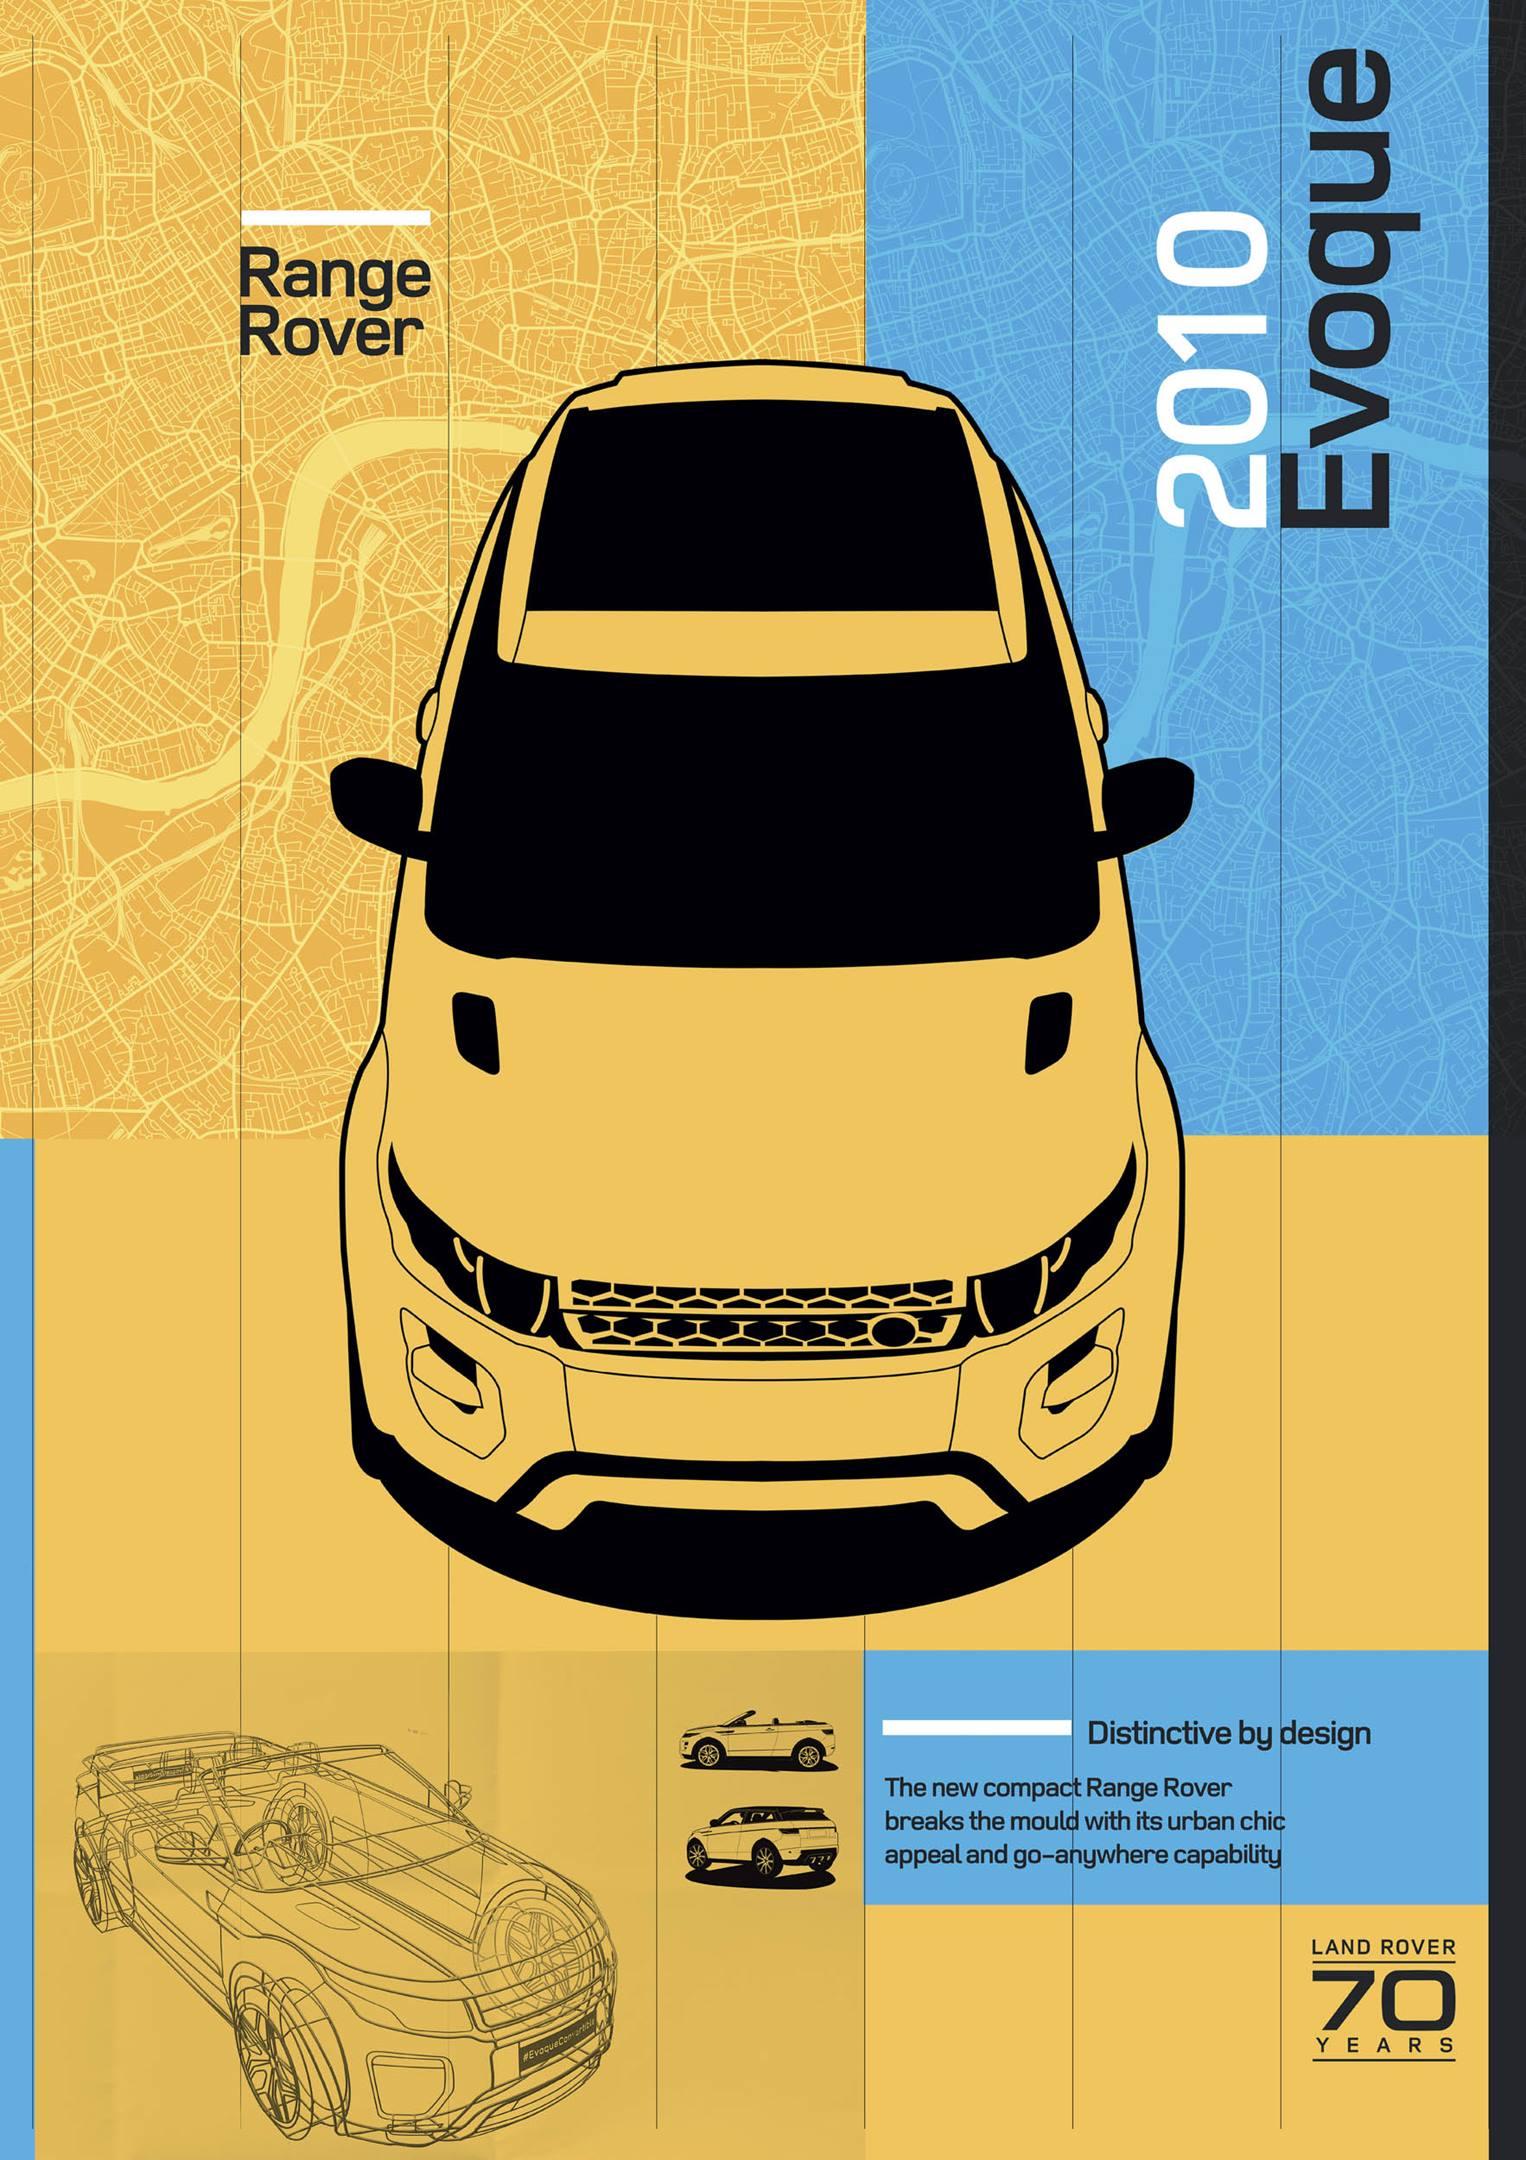 2010 Range Rover Evoque poster